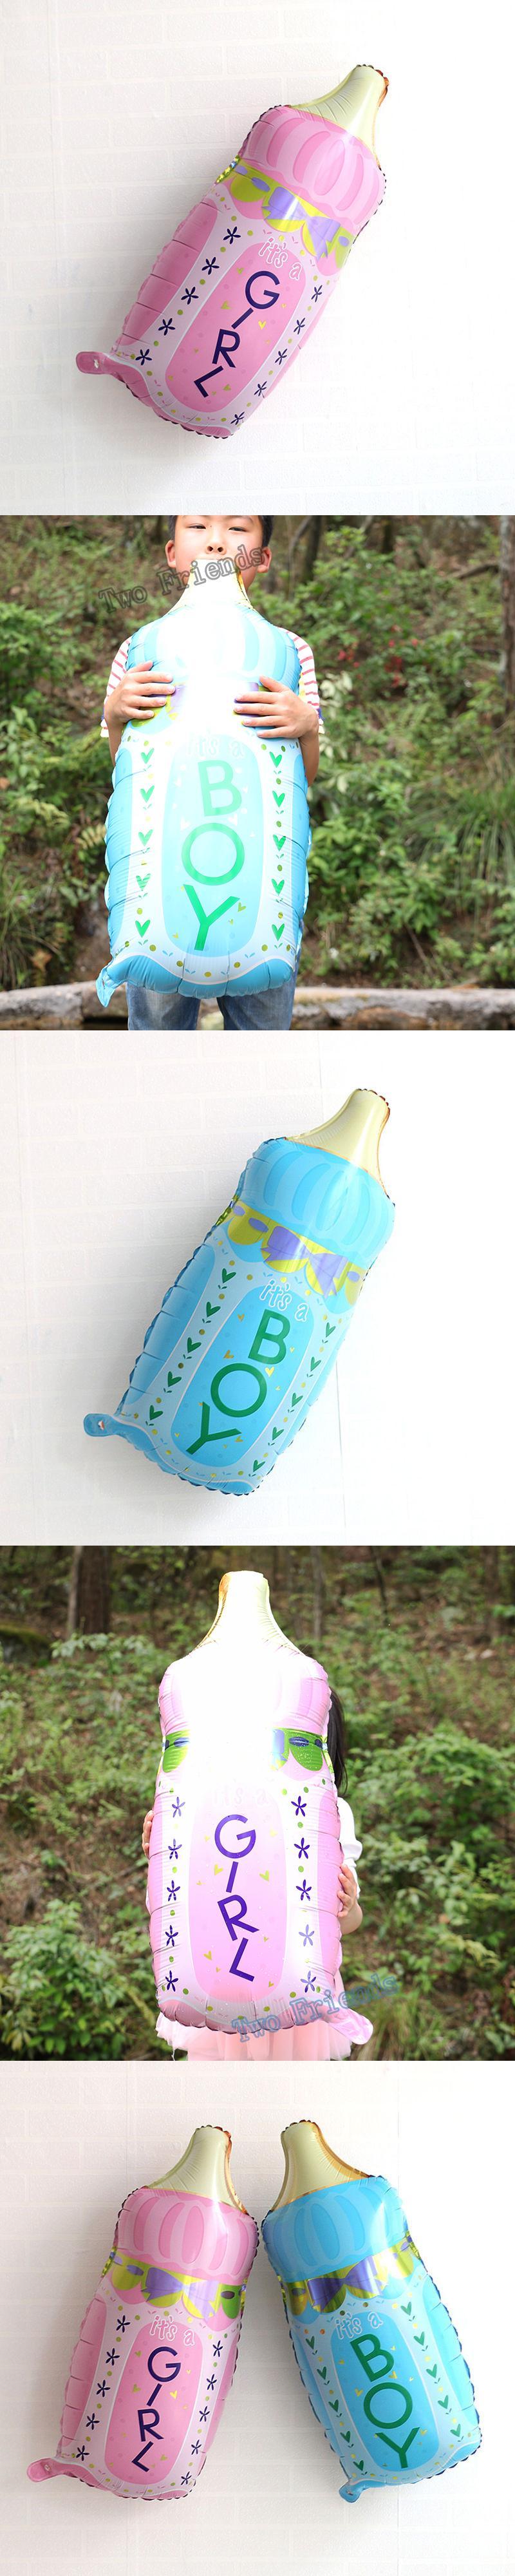 Large Baby Bottle Decoration 1Pc Large Milk Bottle Shape Foil Balloons Birthday Party